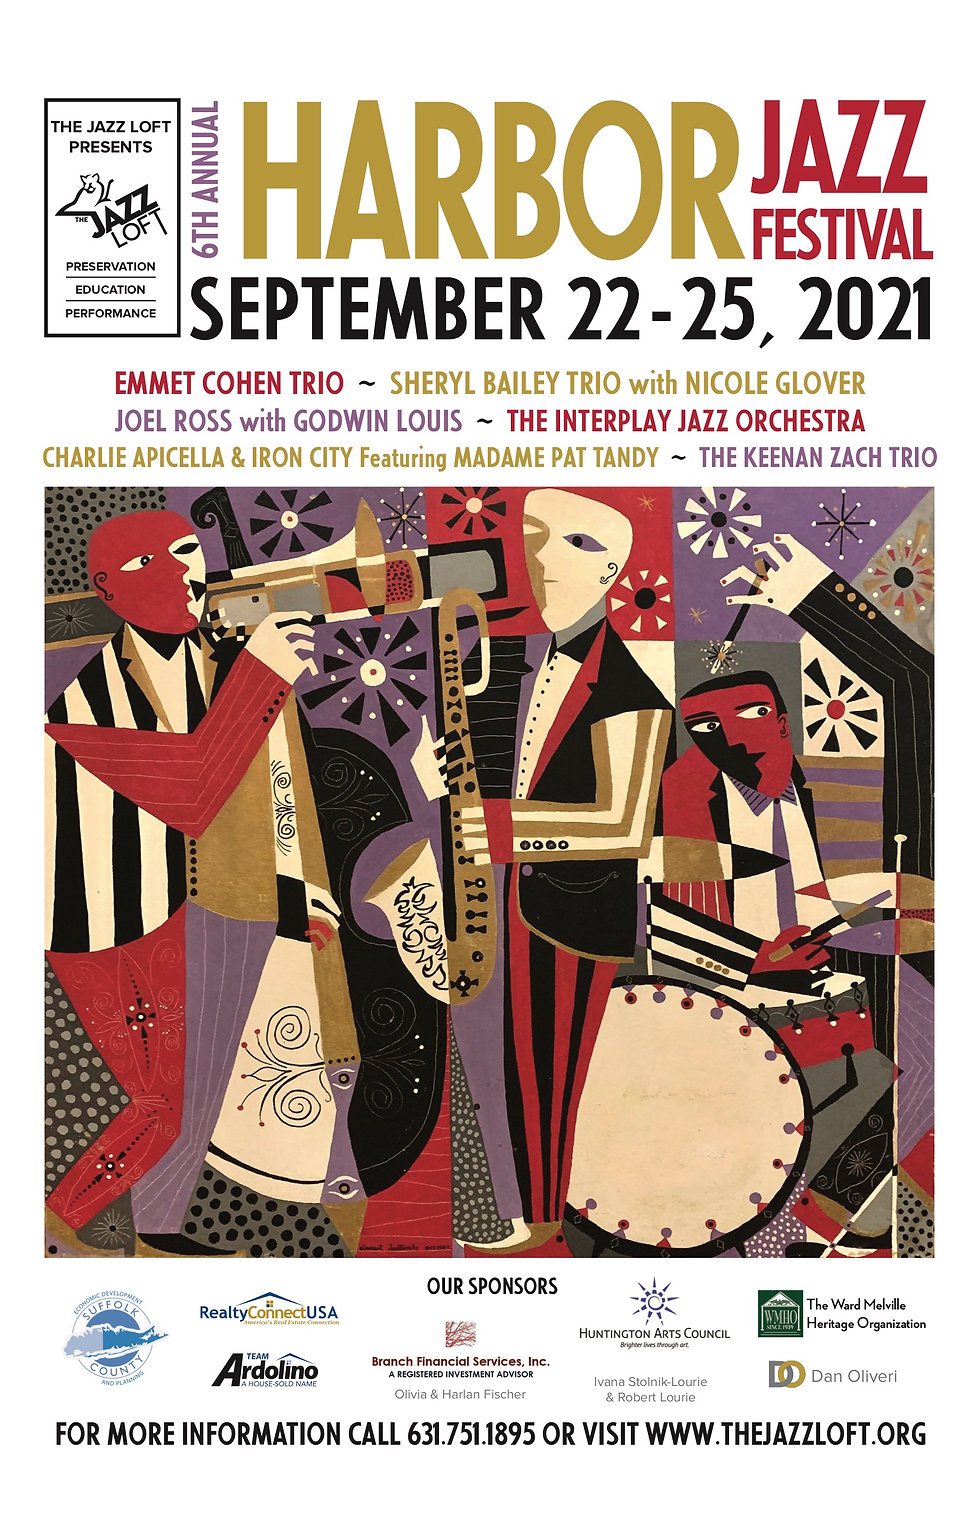 2021 Jazz Festival Poster3a.jpg